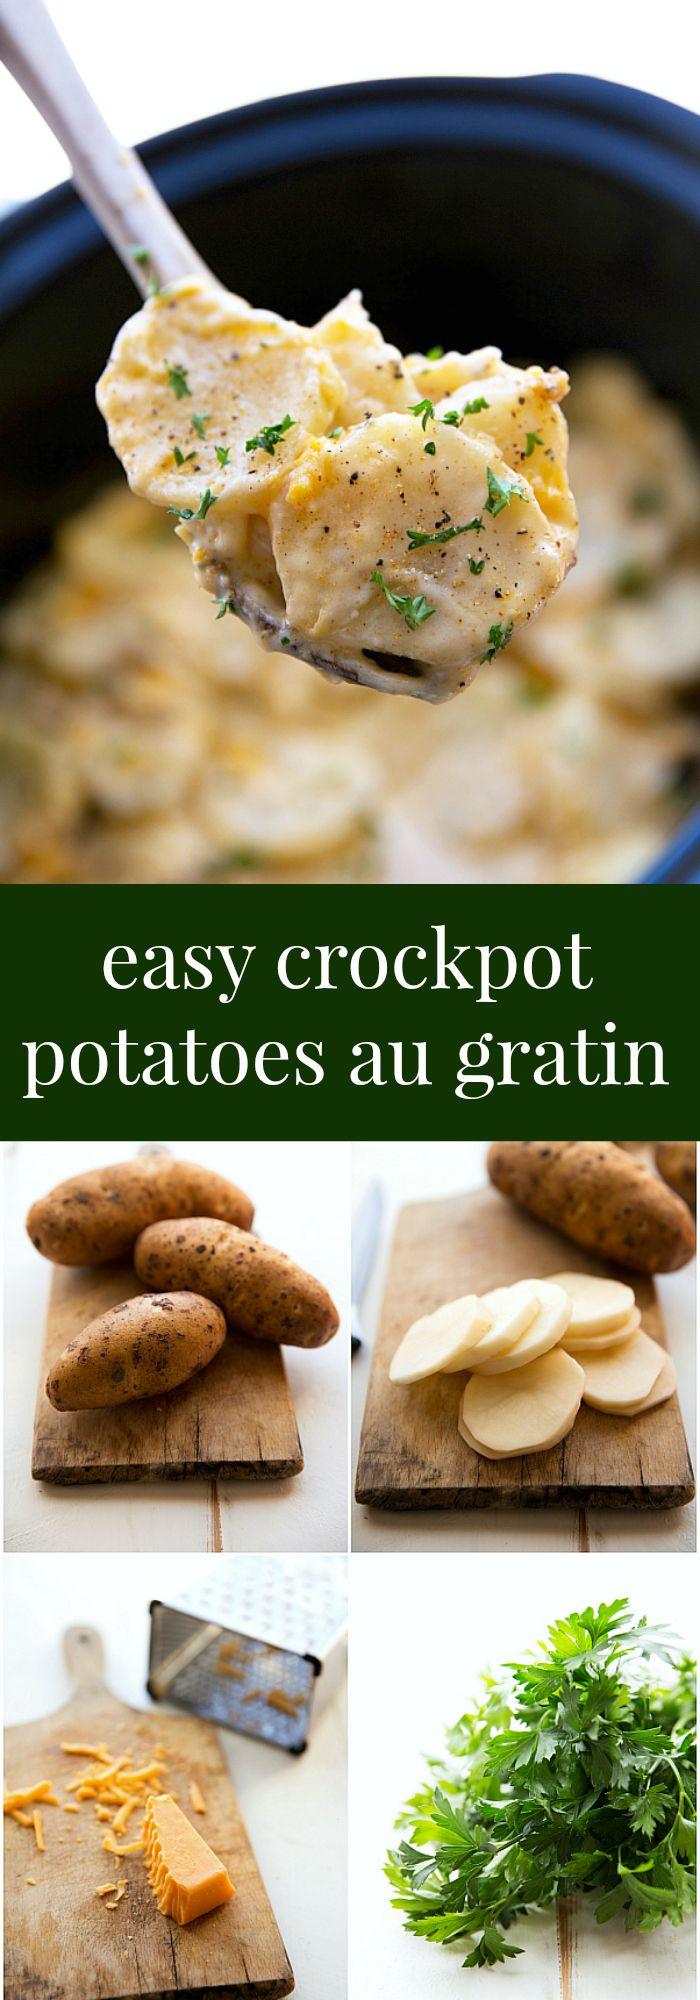 Easy side dishes potato recipes